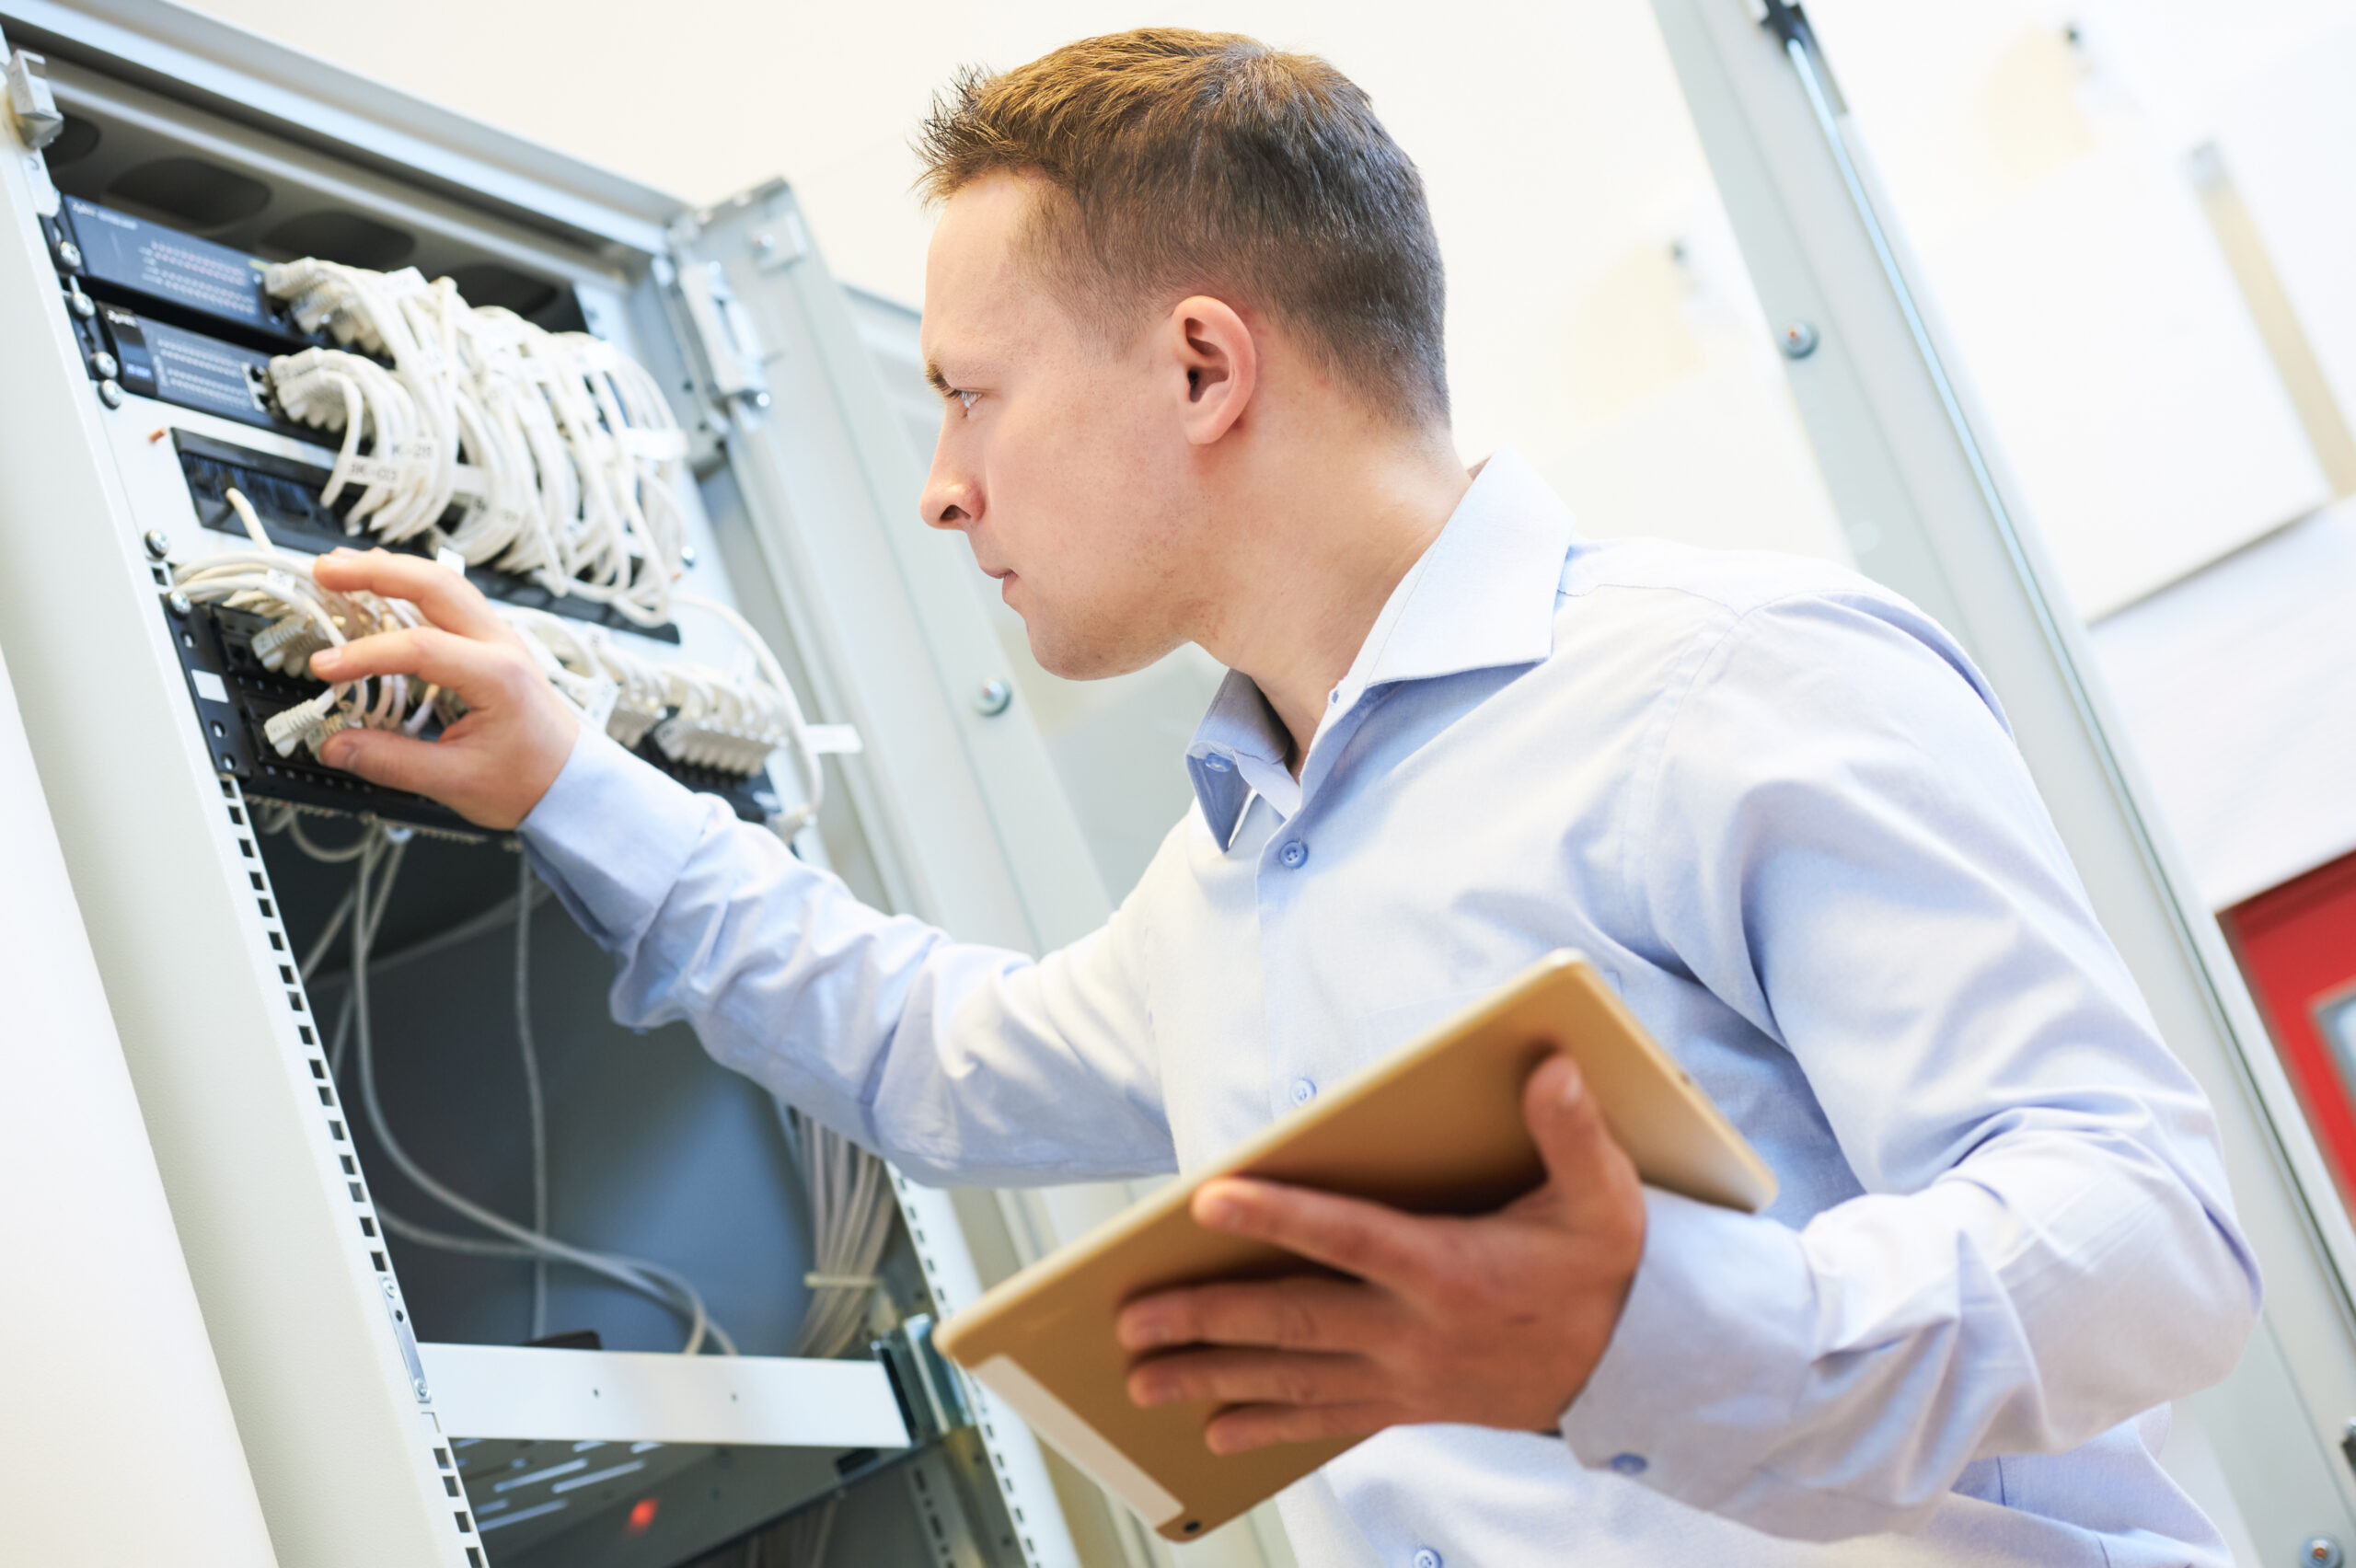 Utah IT Professional Working on Server